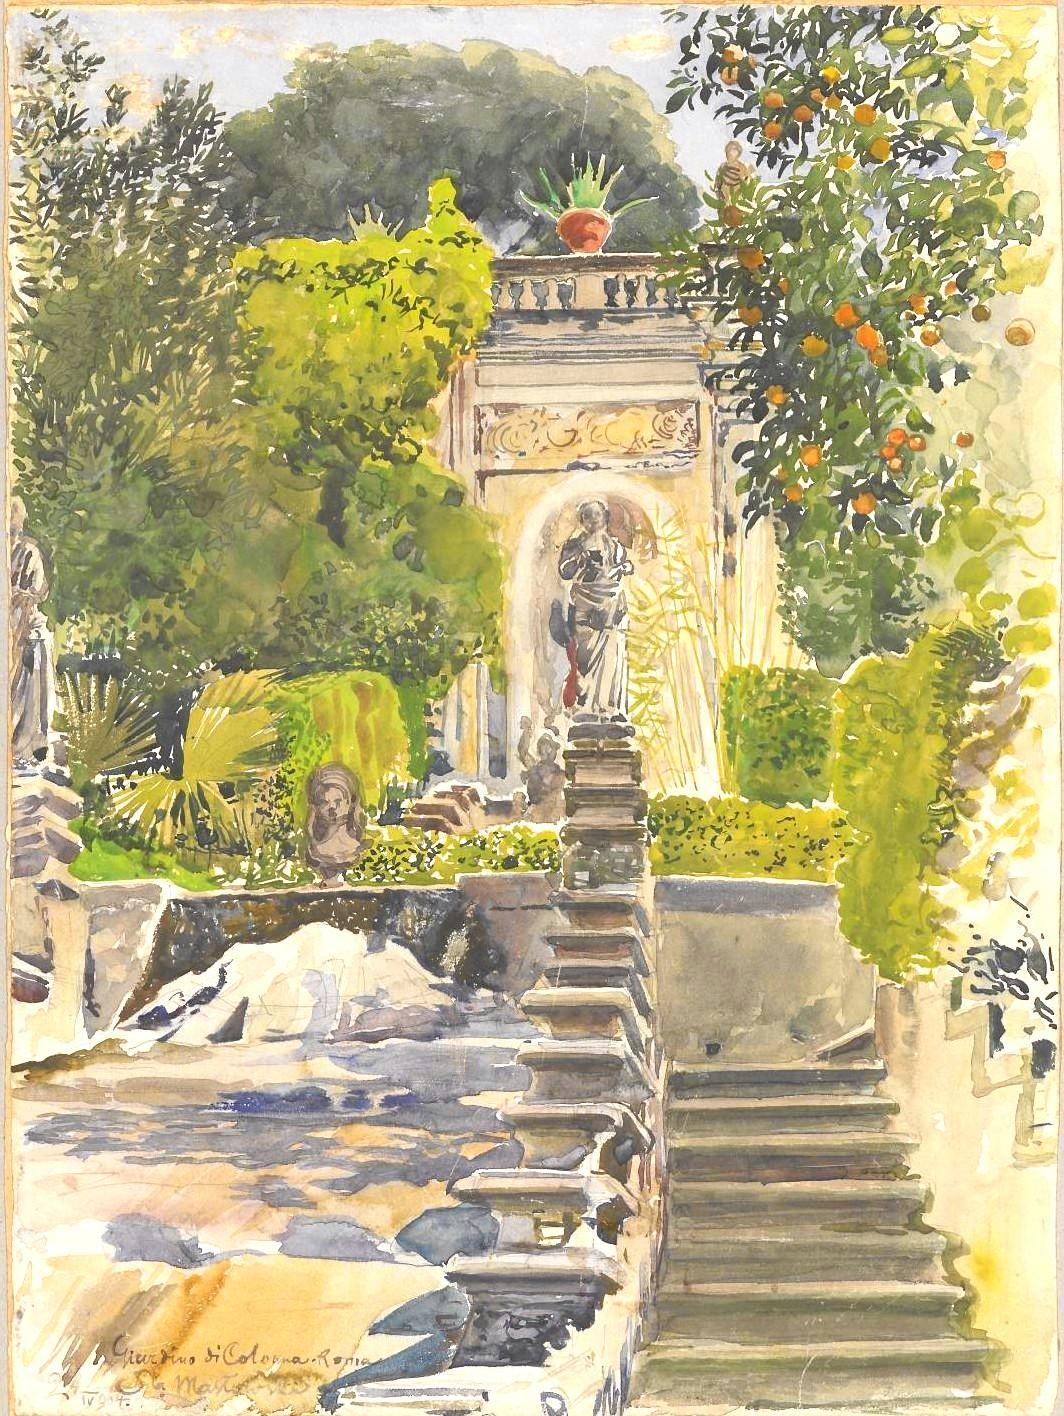 FileStanisaw Masowski 1853 1926 Fountain at Garden of